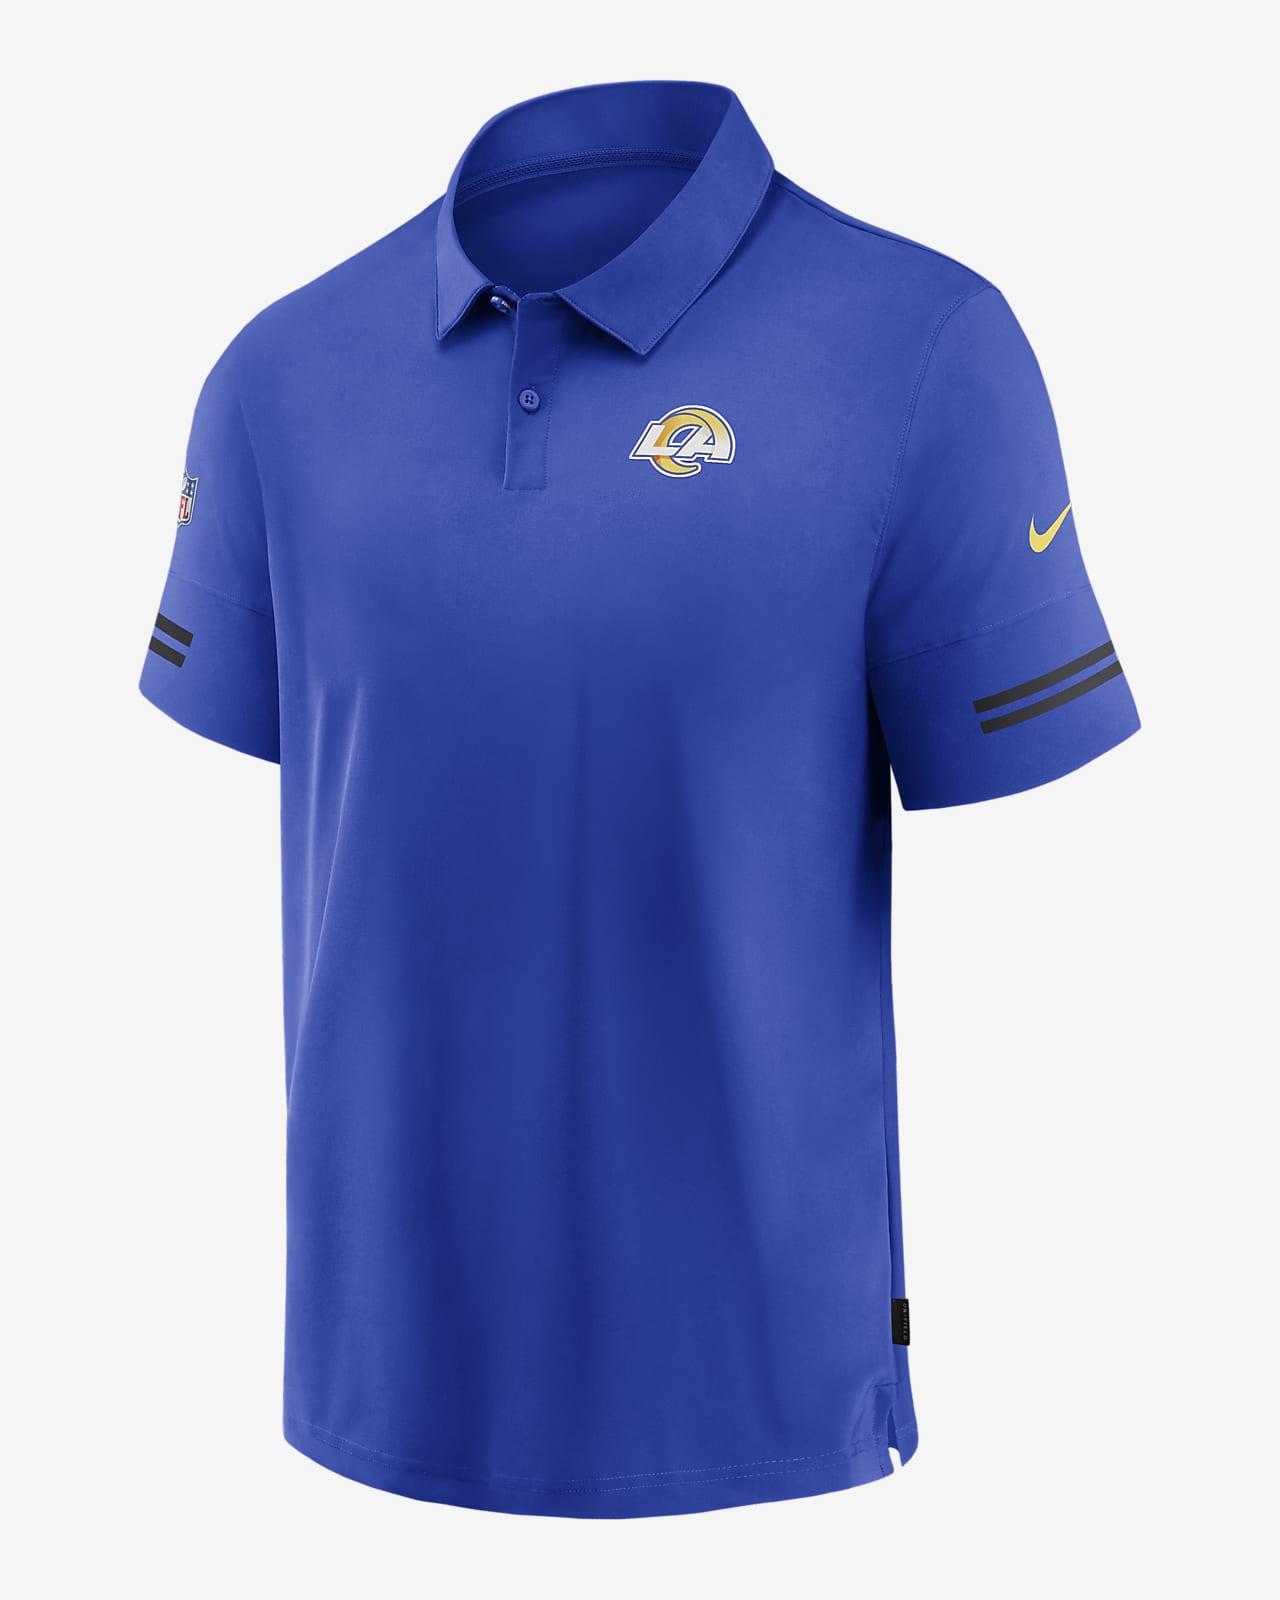 Elegibilidad cuchara flexible  Nike Logo (NFL Rams) Men's Short-Sleeve Polo. Nike.com